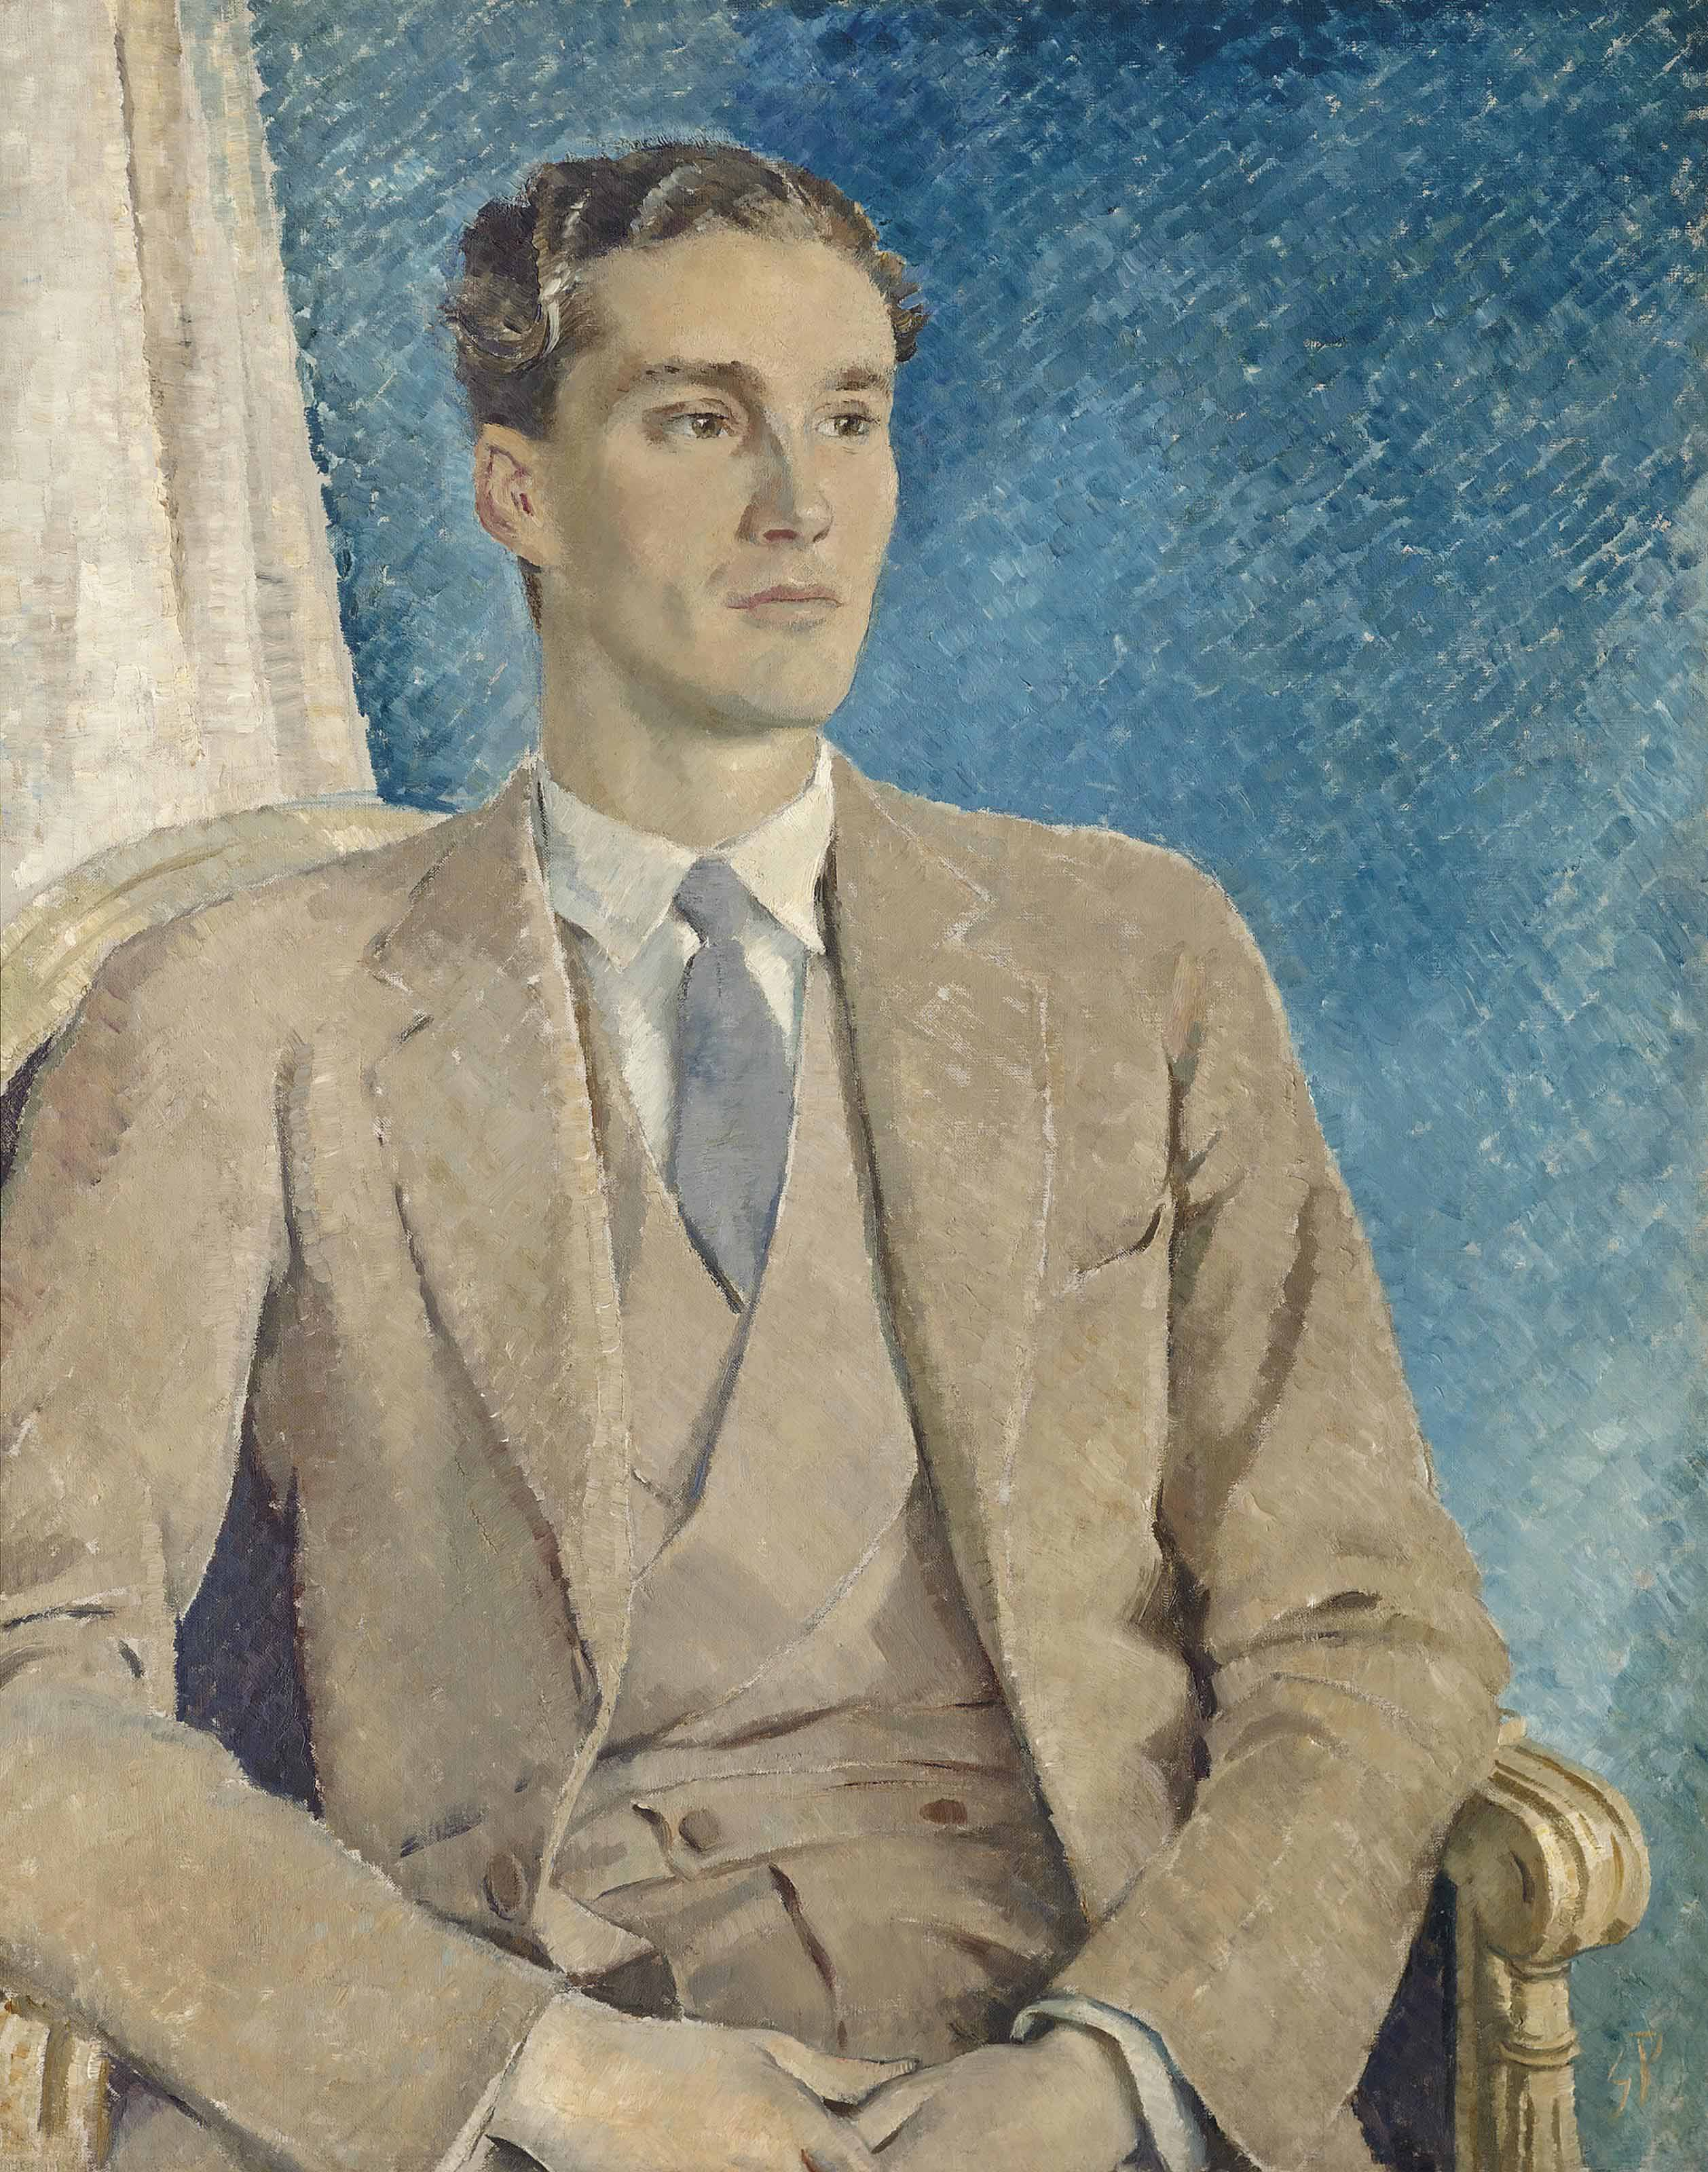 Portrait of Patrick Buchan-Hepburn, Lord Hailes